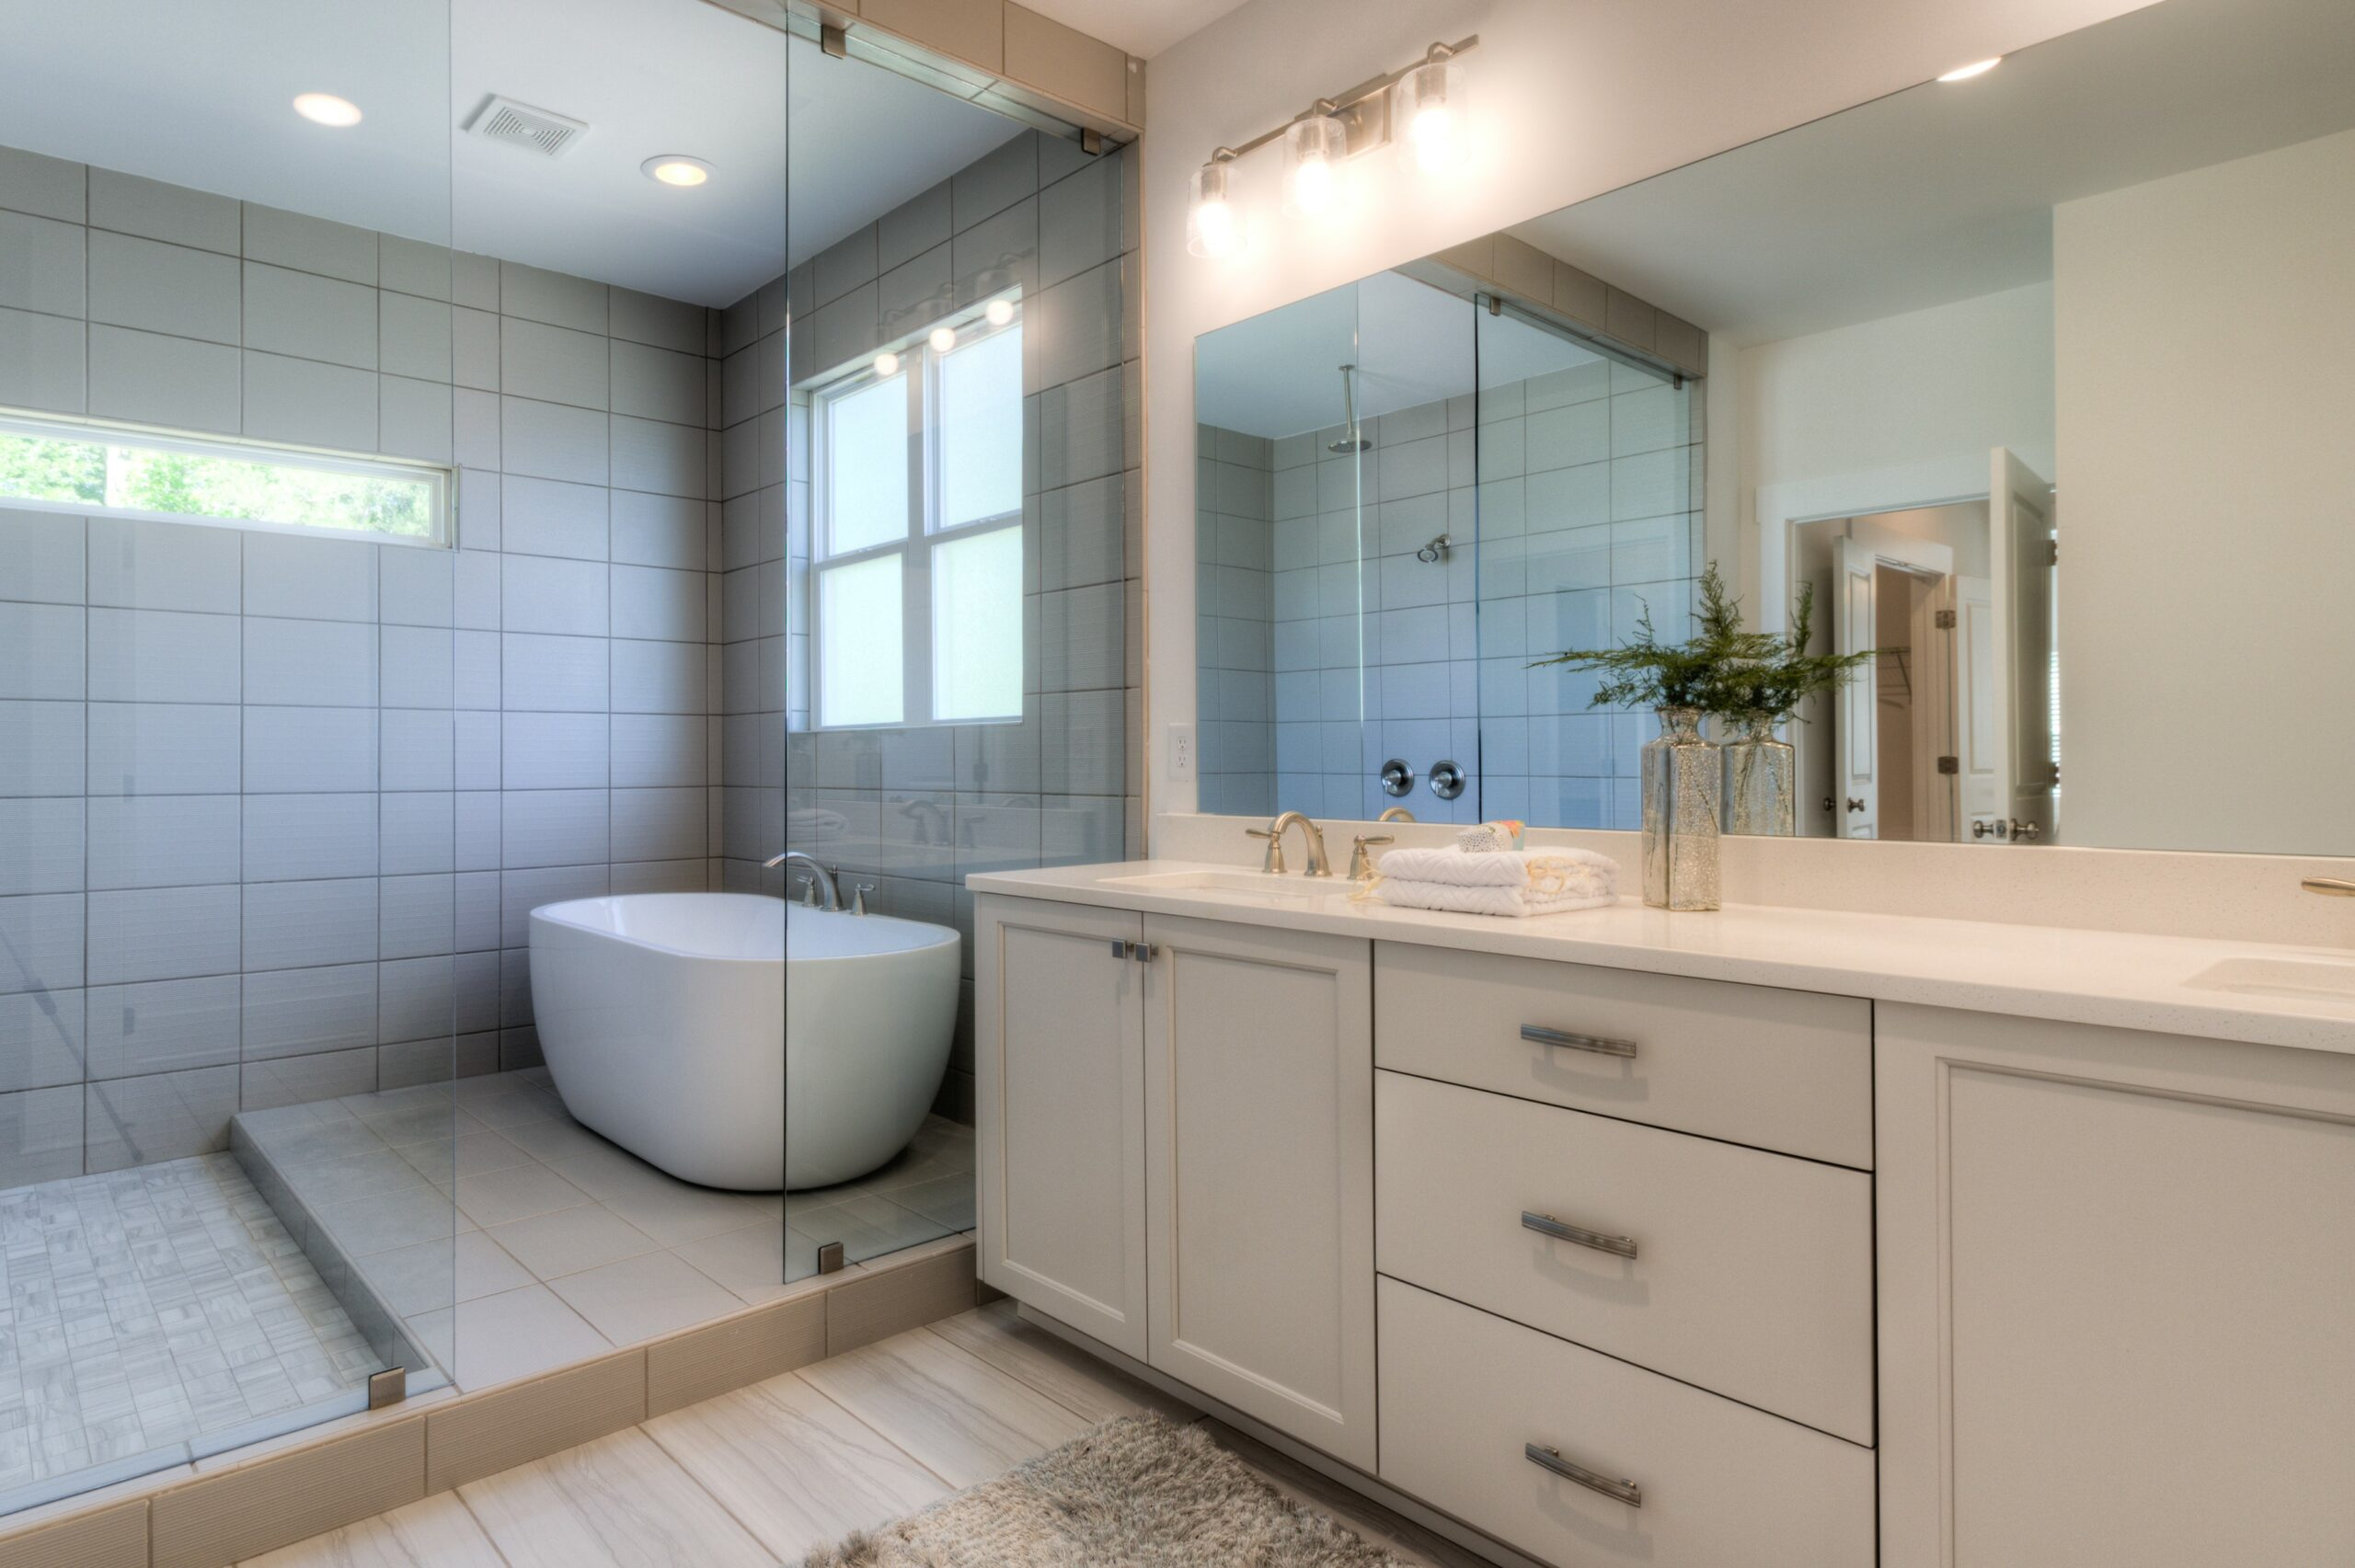 Cooper plan master bath with wet room